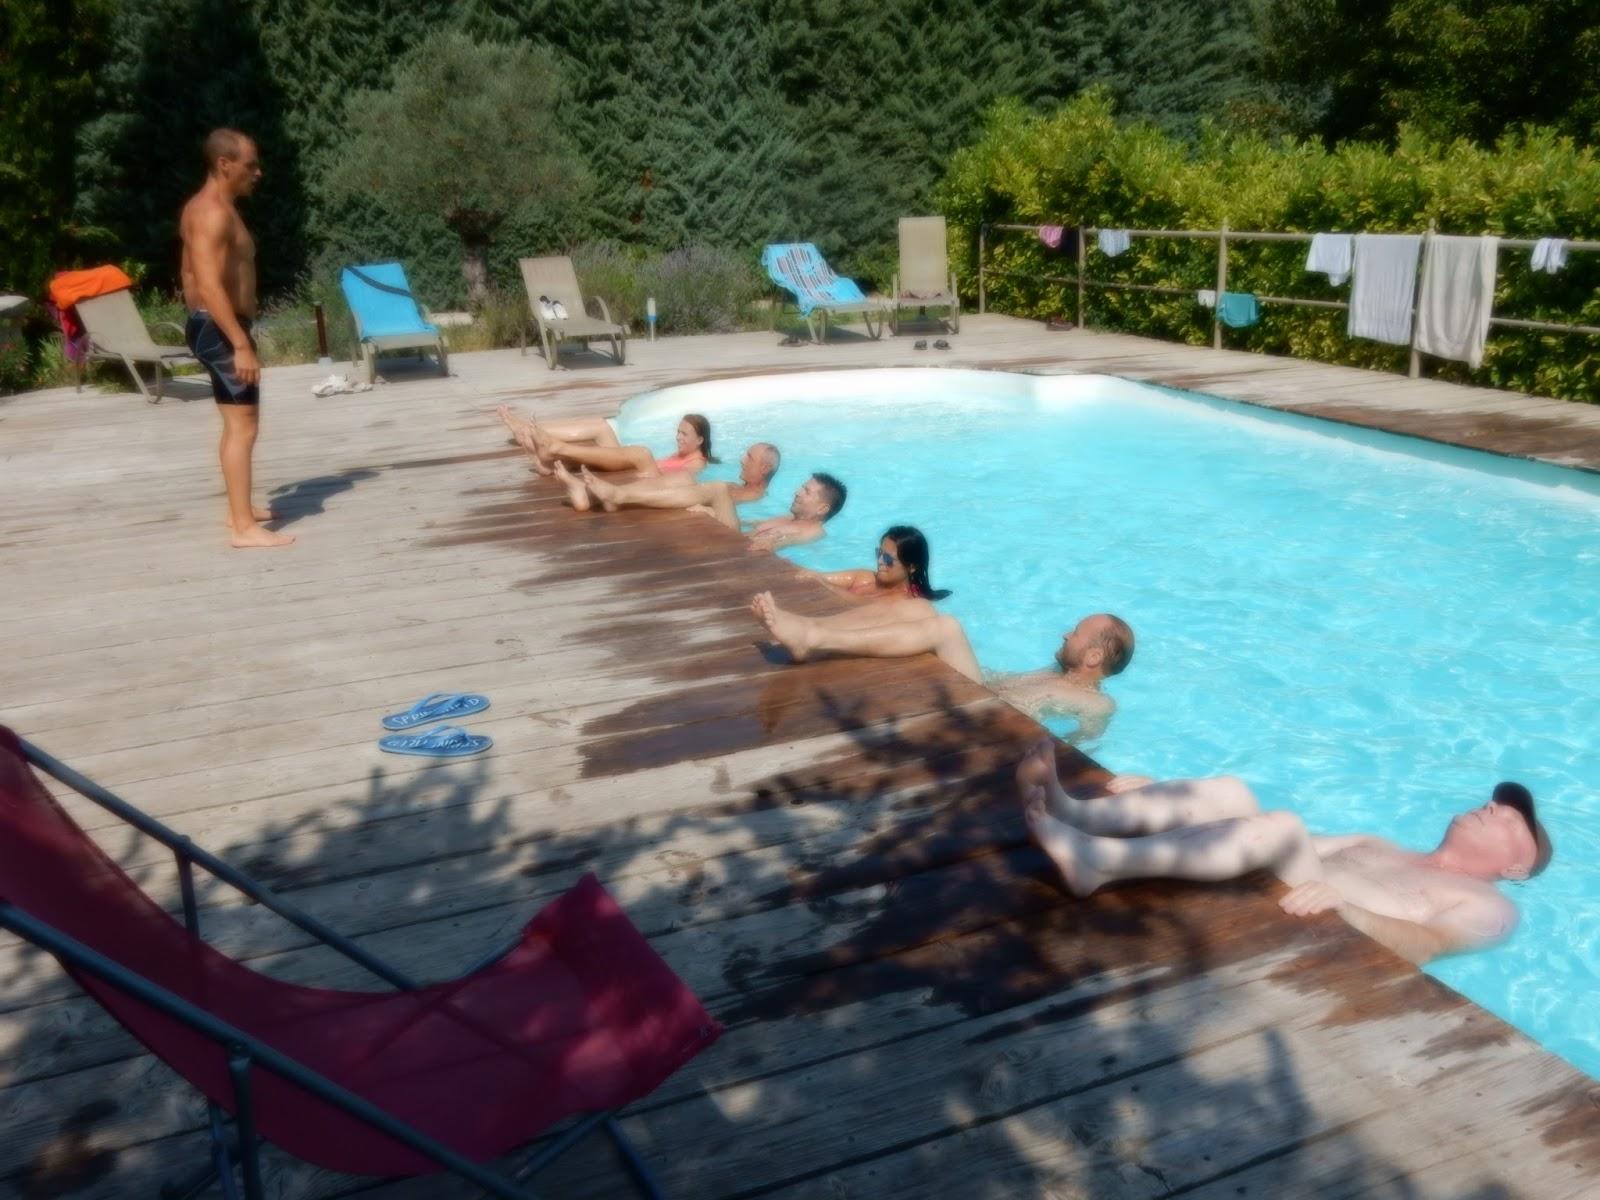 Gr gory capra water polo en luberon for Aqualsace piscine